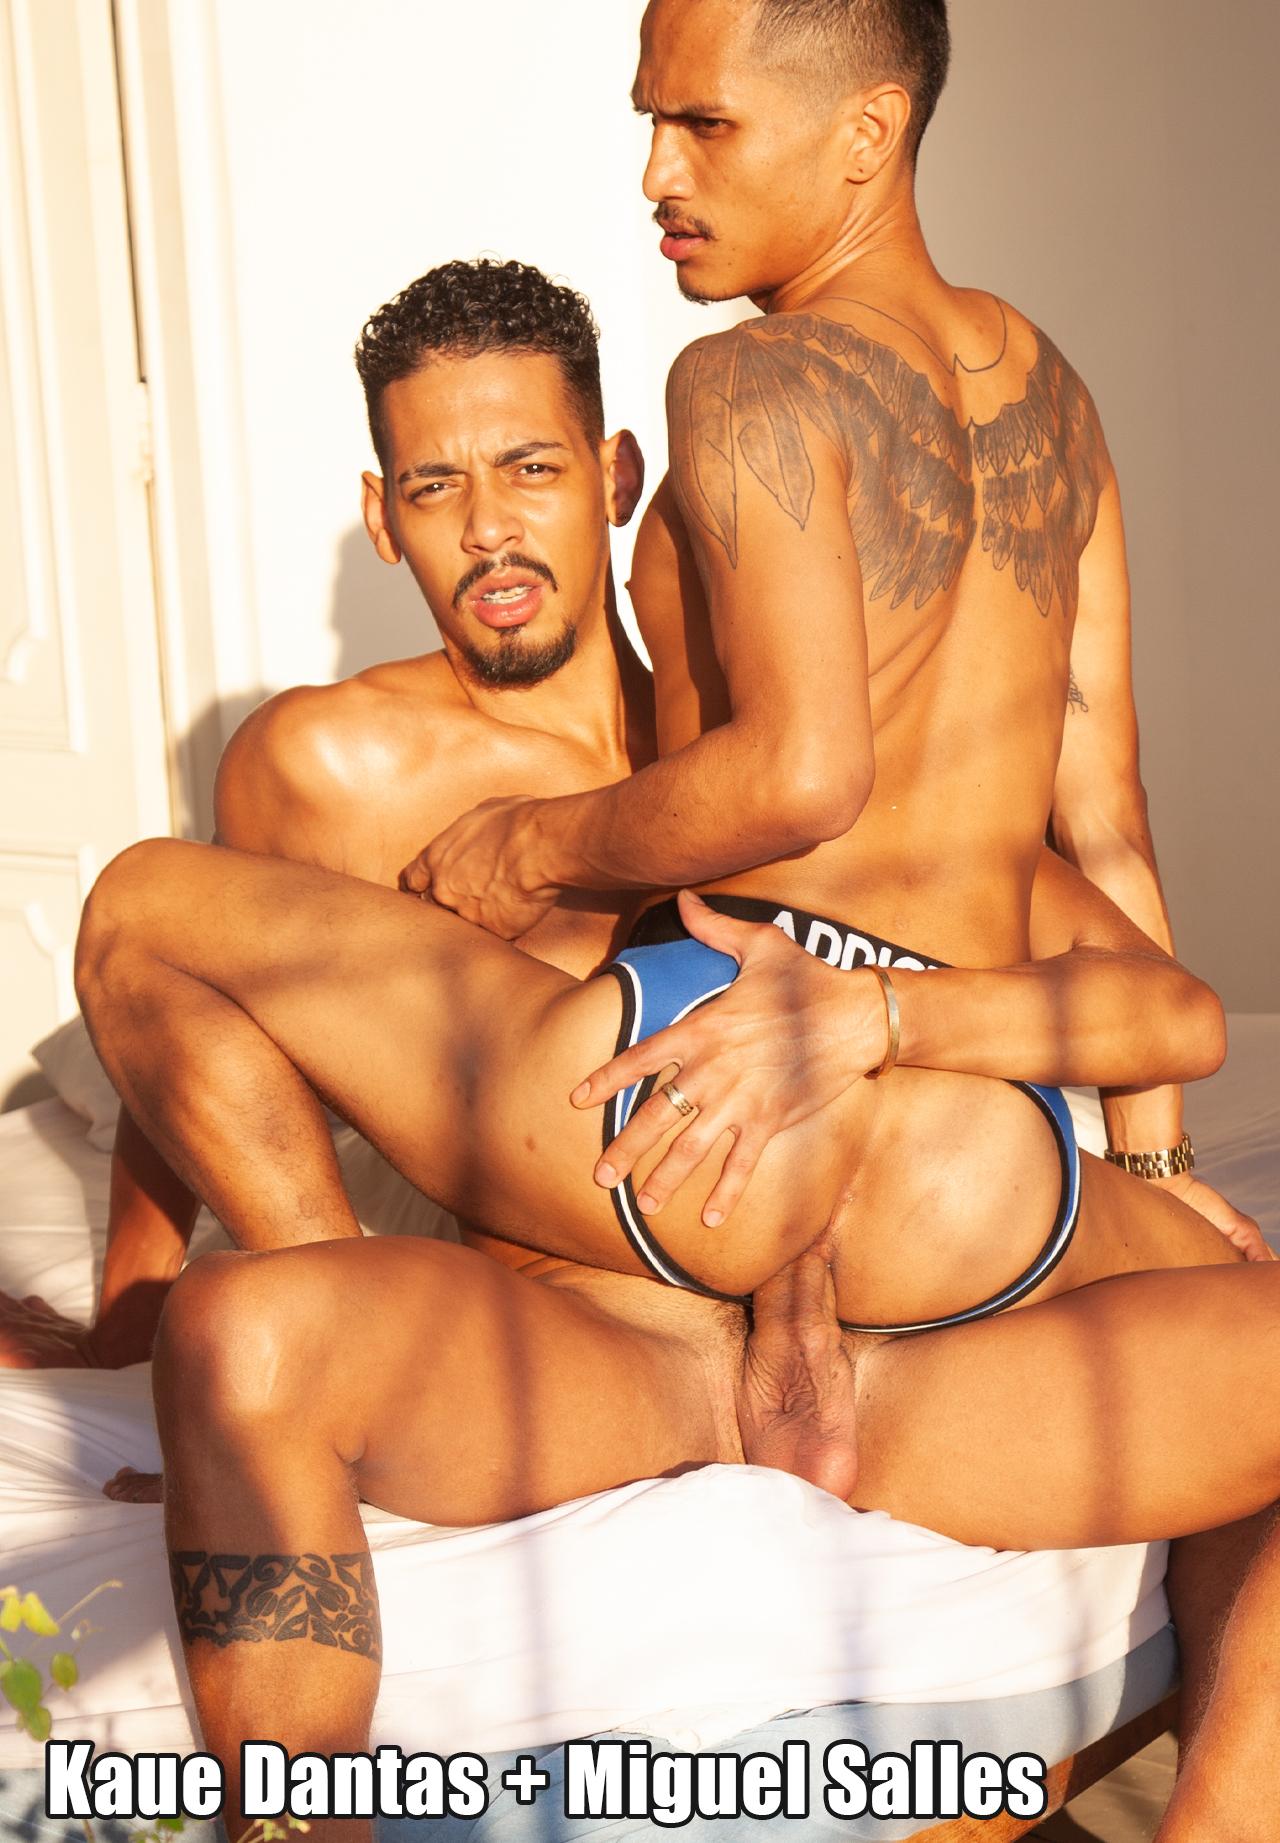 Kaue Dantas & Miguel Salles - ROOF SEX